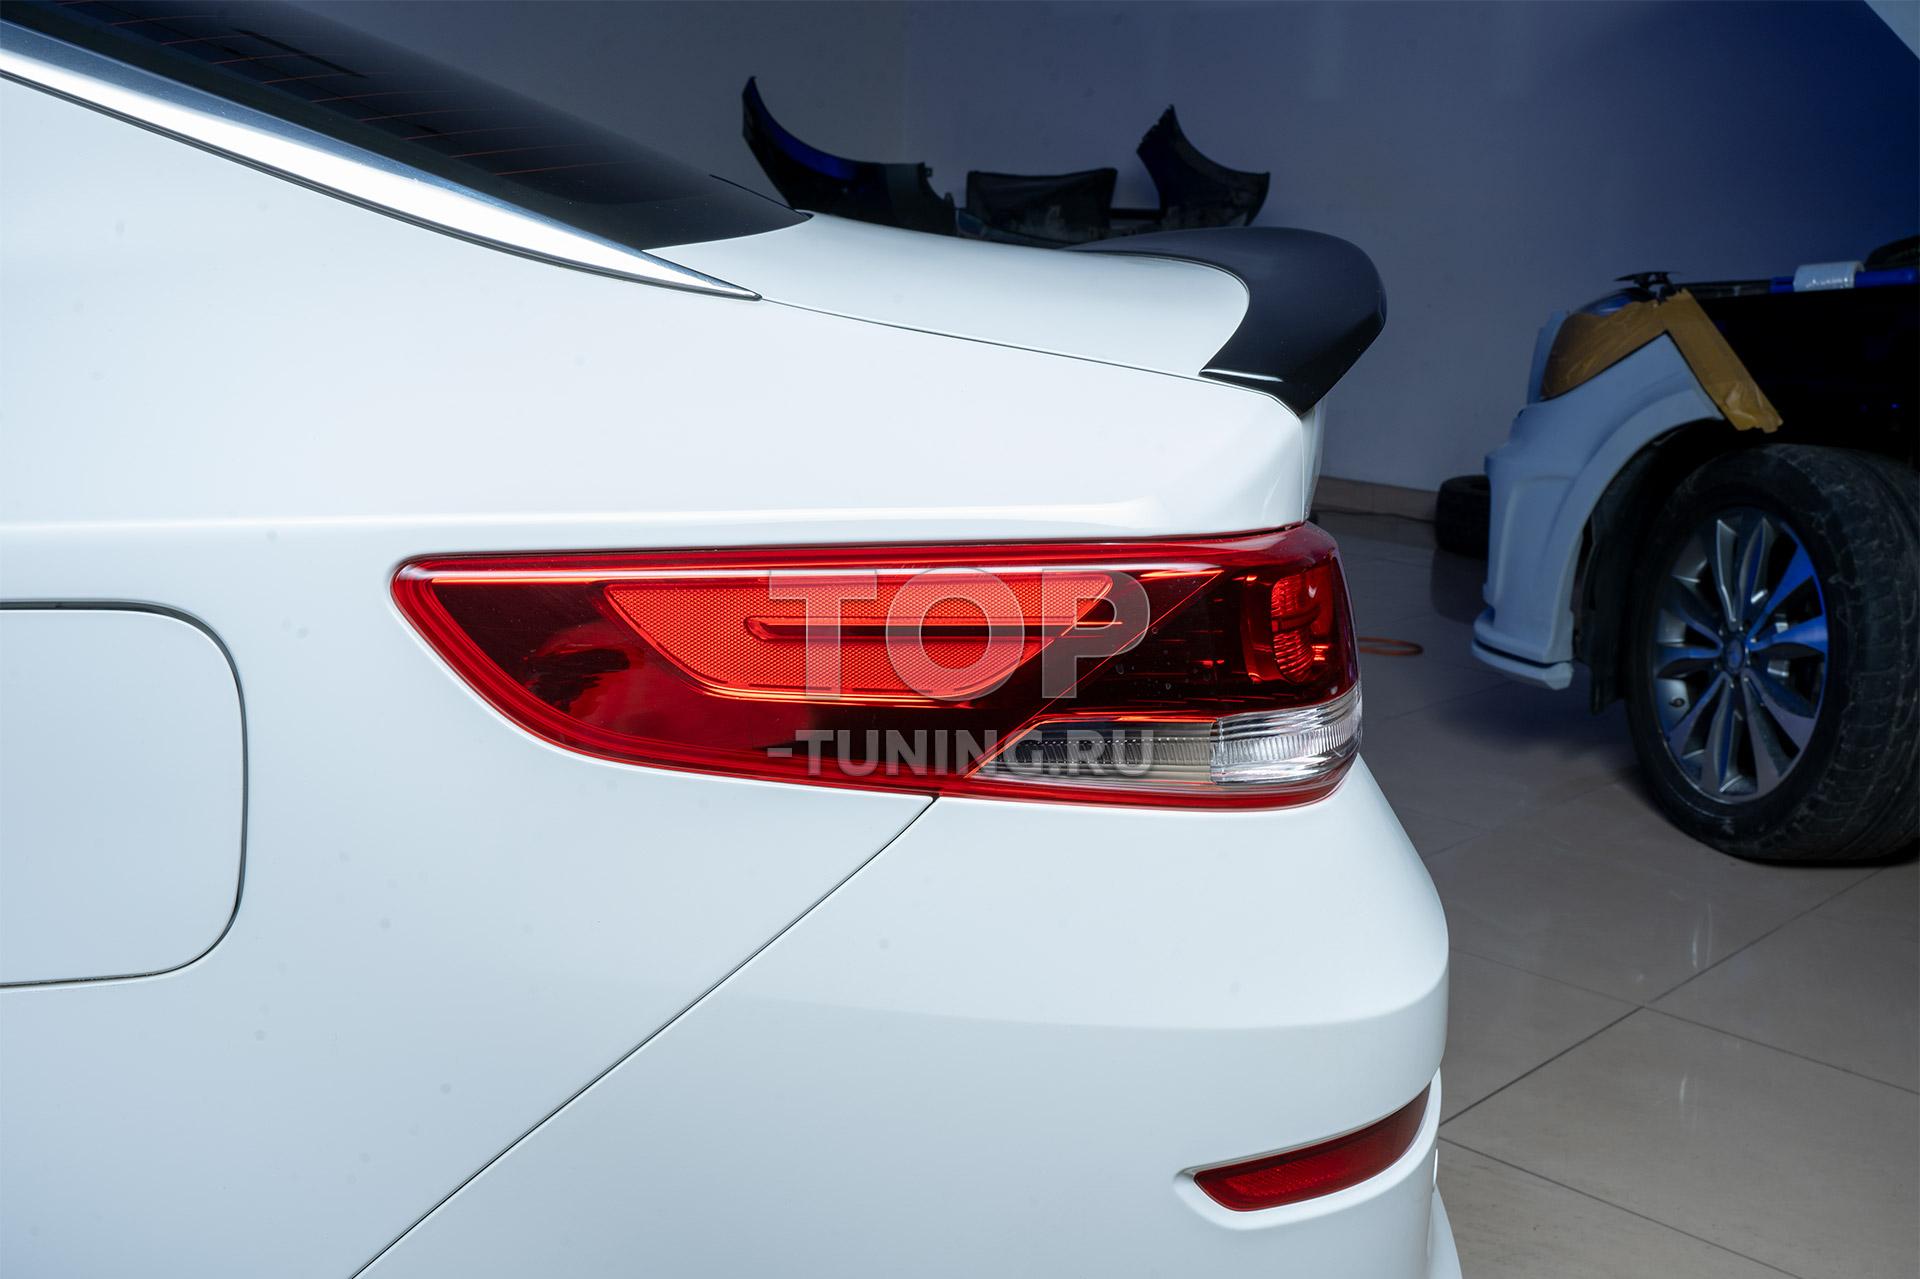 Установка спойлера Advance на багажник для Kia Optima 4 белого цвета